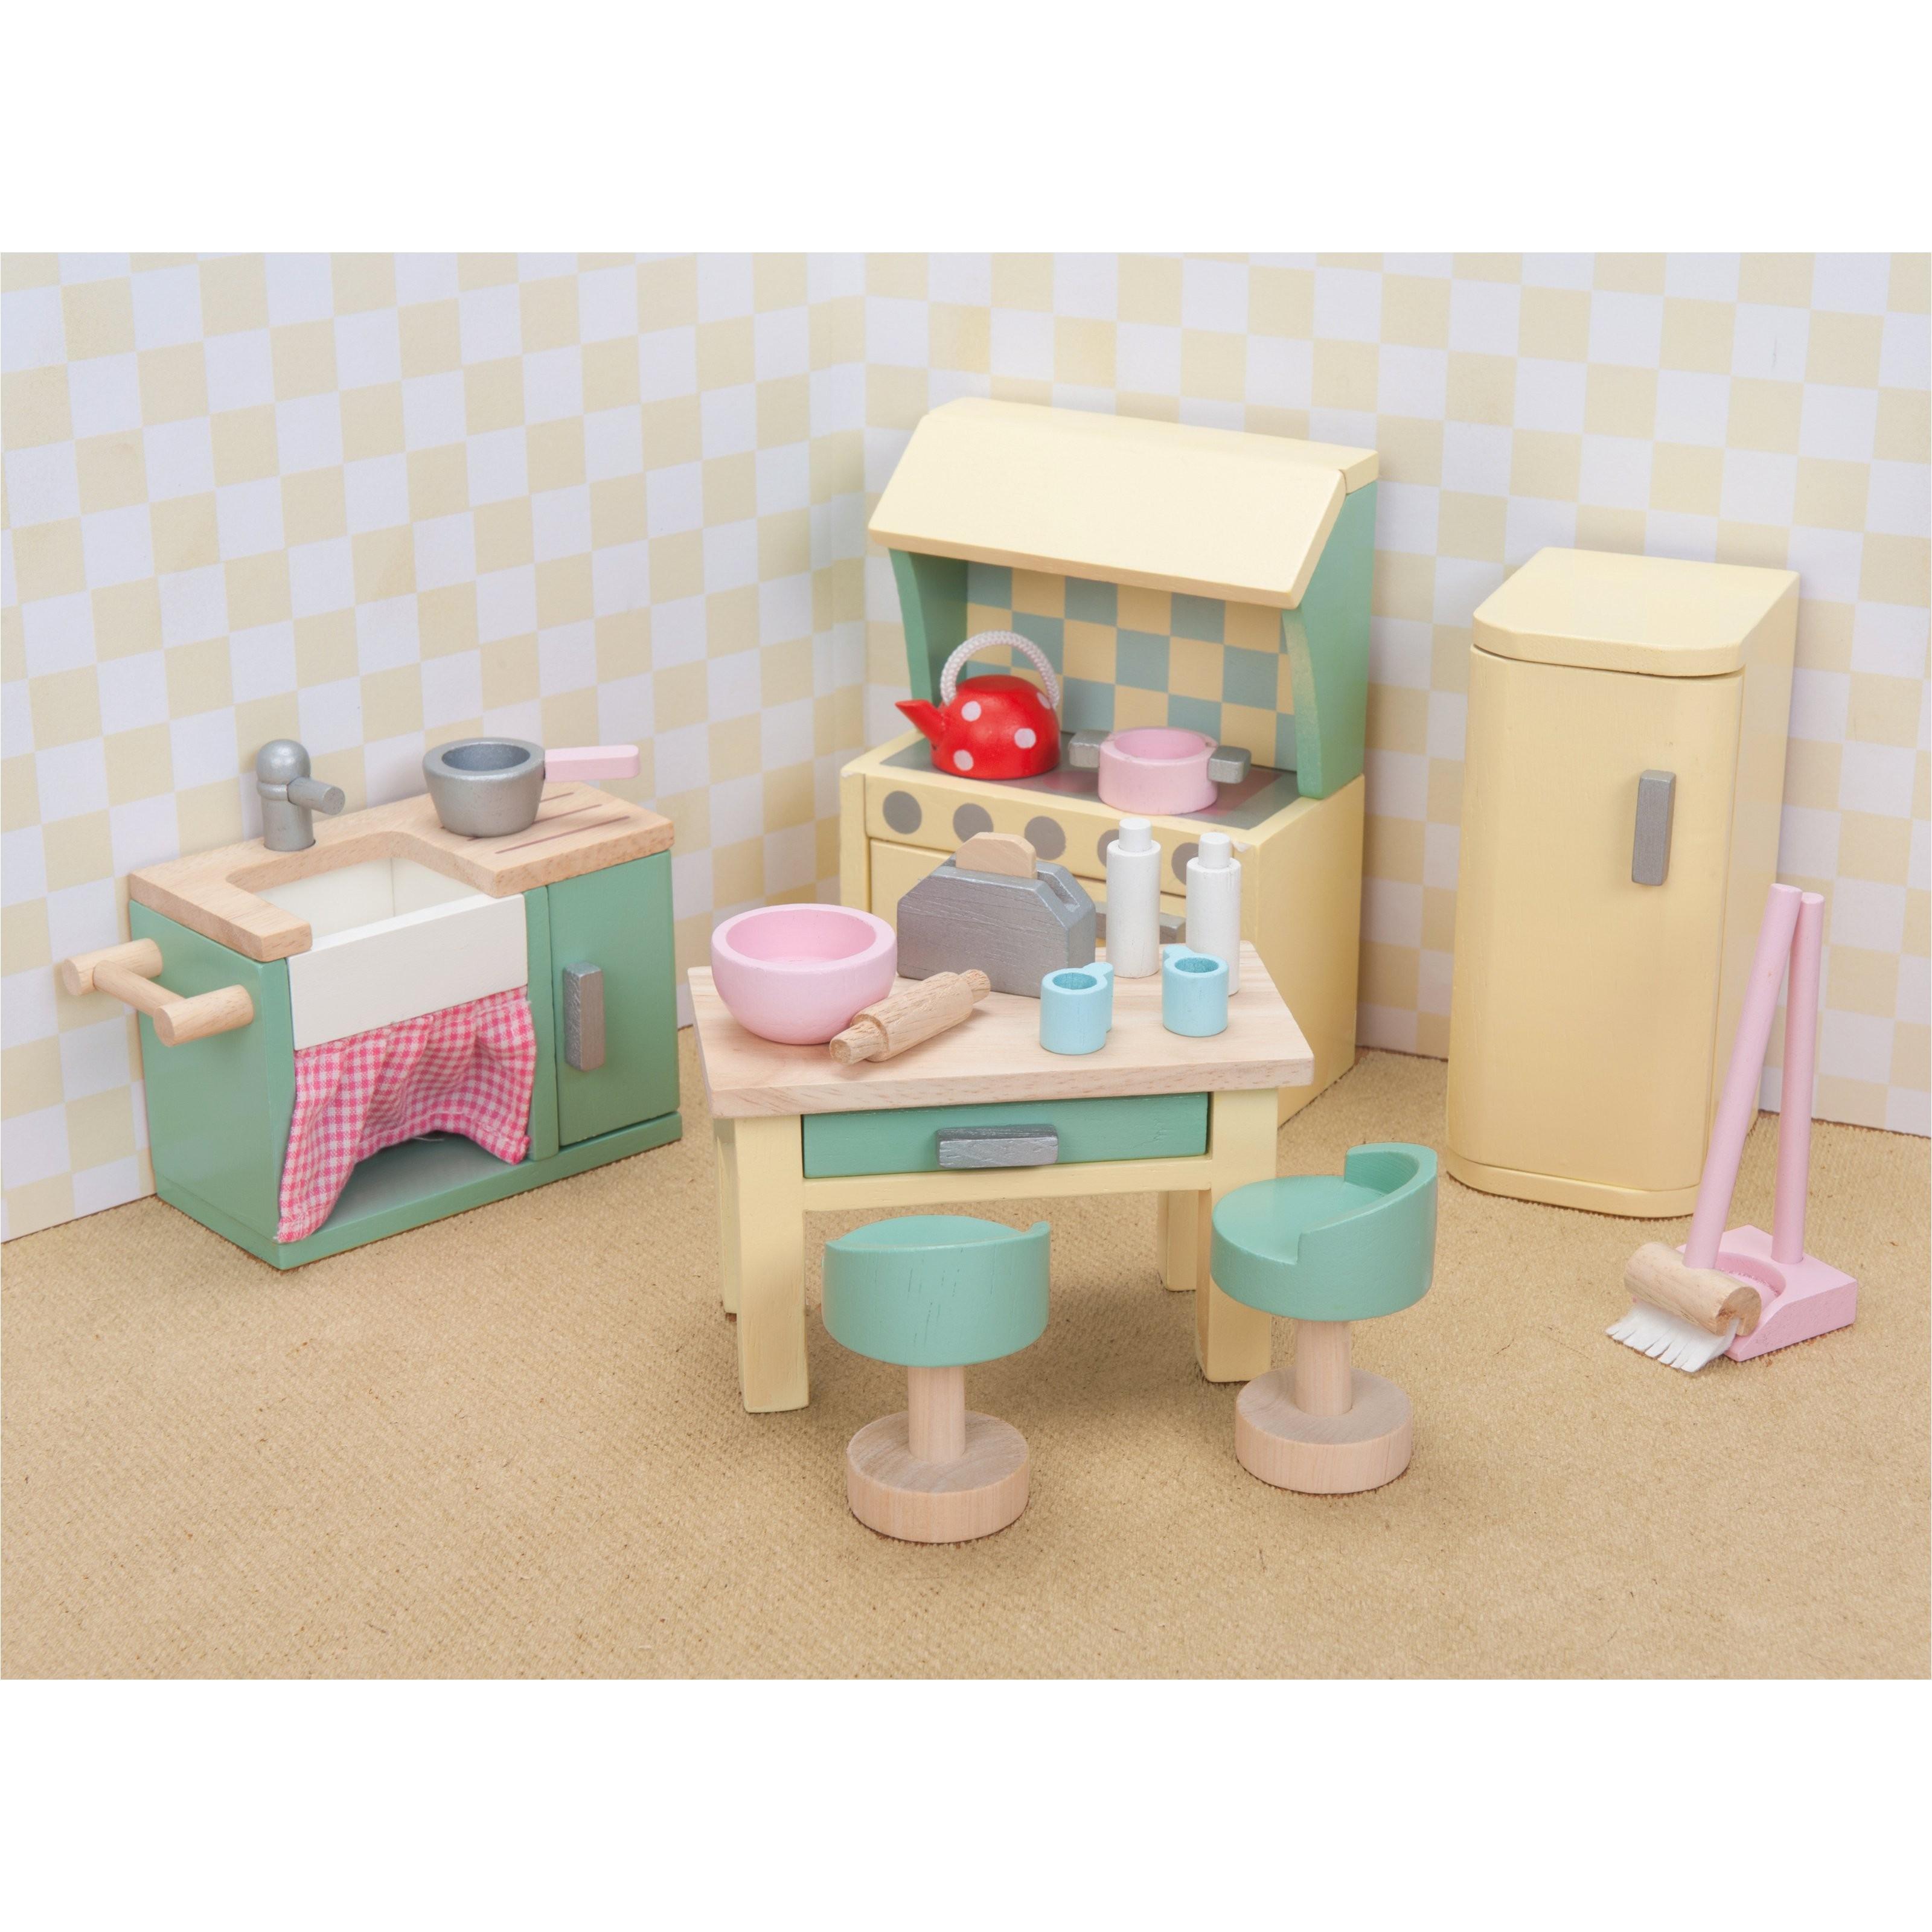 Kidkraft Dollhouse Furniture Set 28 Pieces Awesome Kidkraft